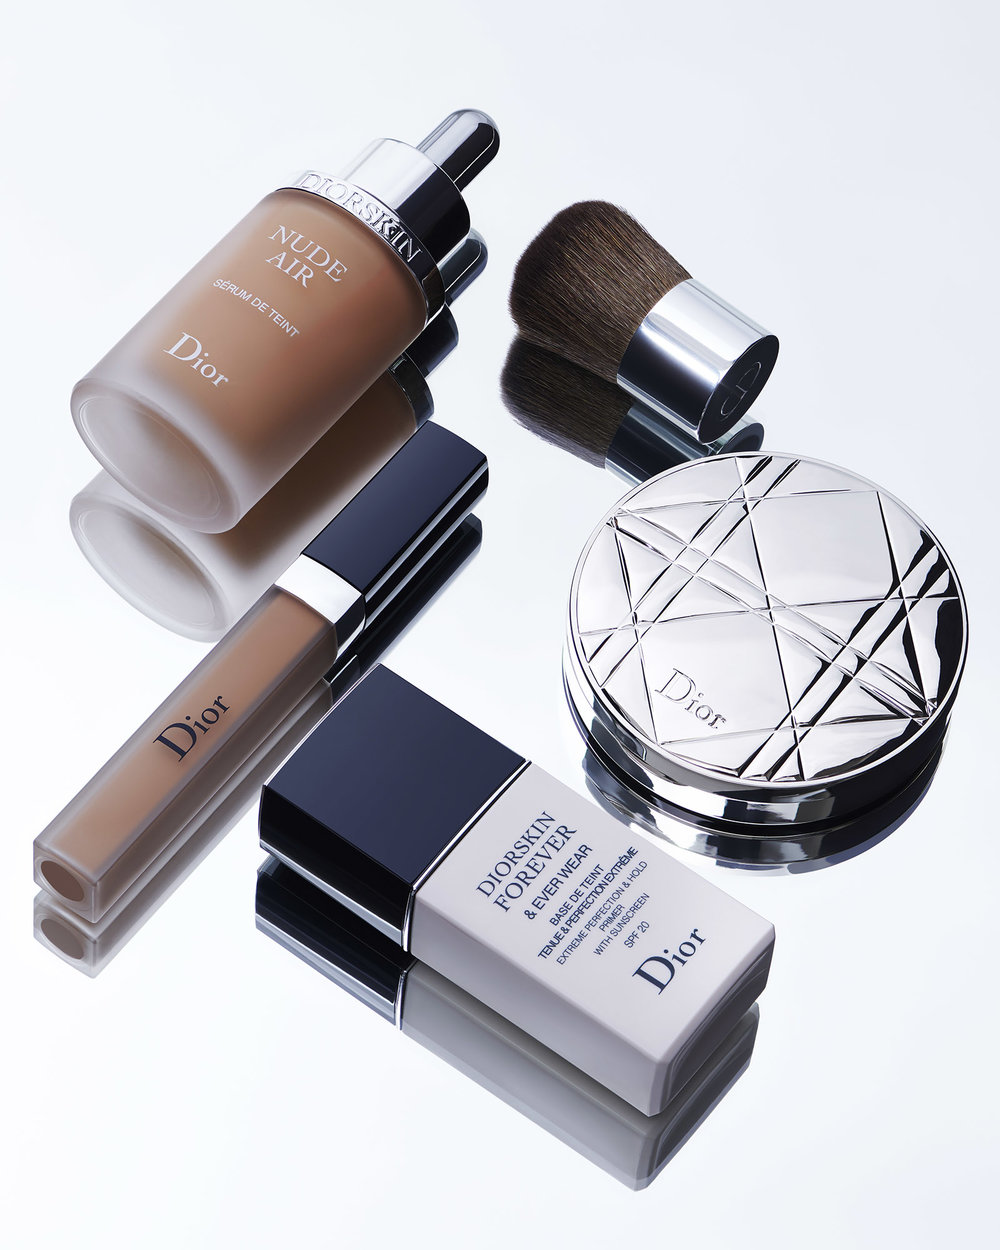 Dior-Group-1-1.jpg